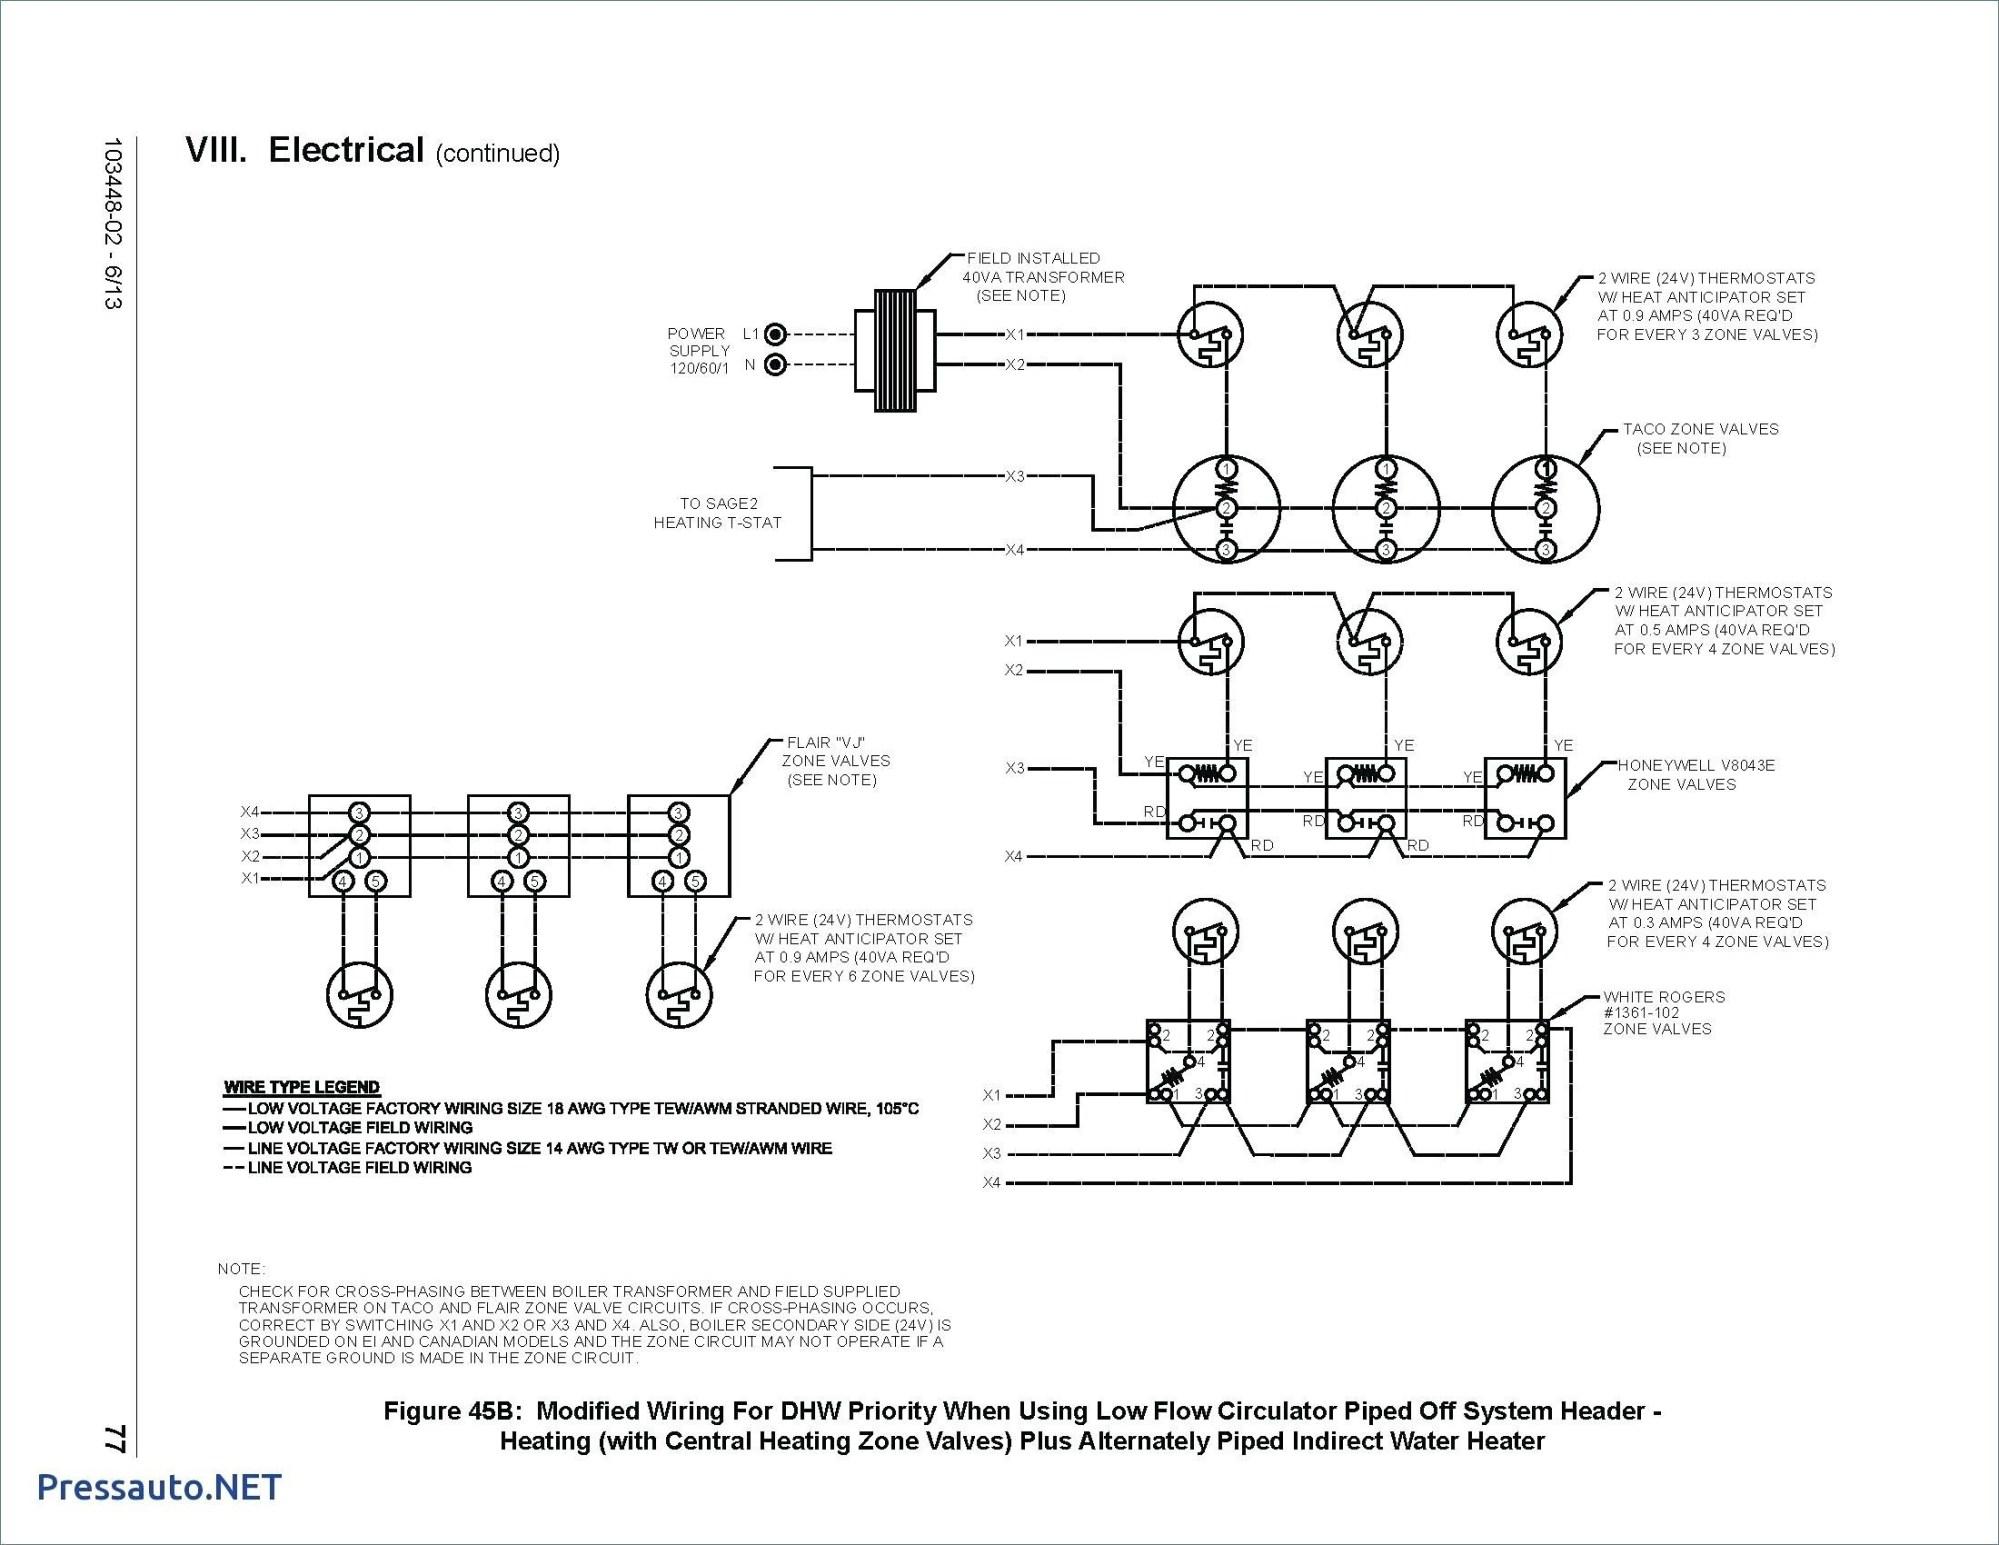 hight resolution of taco 571 zone valve wiring diagram taco zone valve 24v wiring diagram wire center u2022